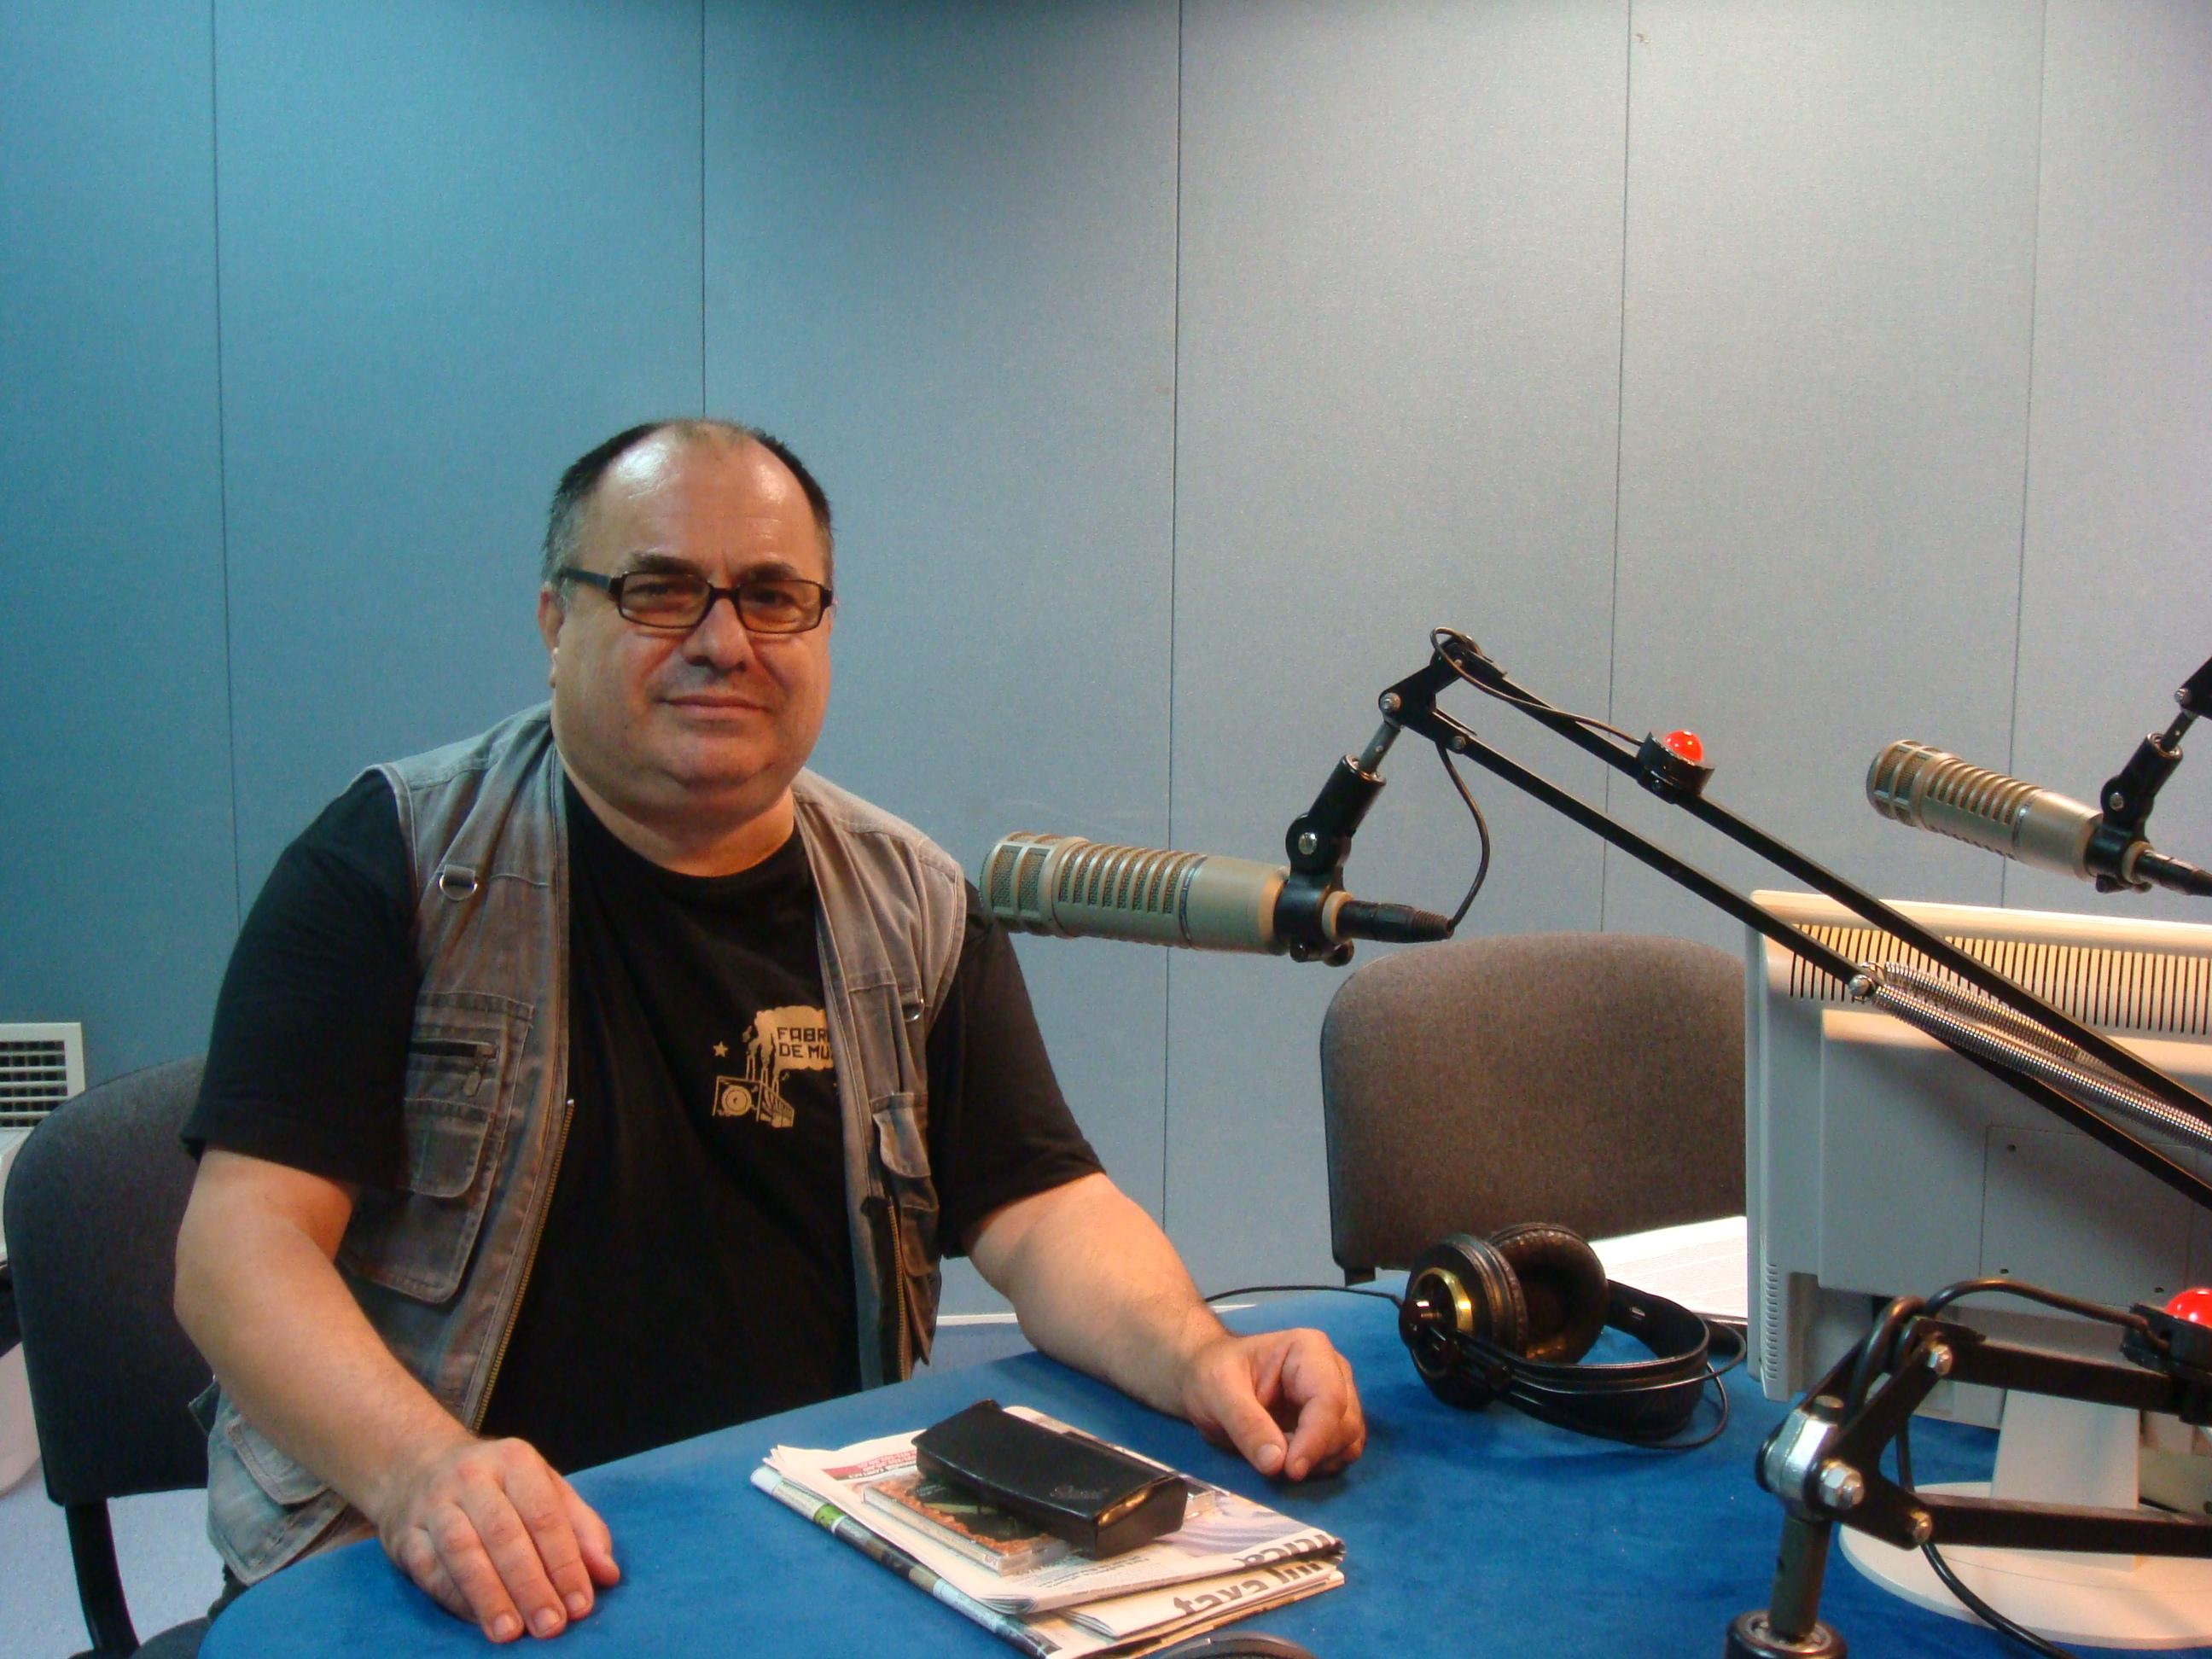 Nelu Stratone during his radio show